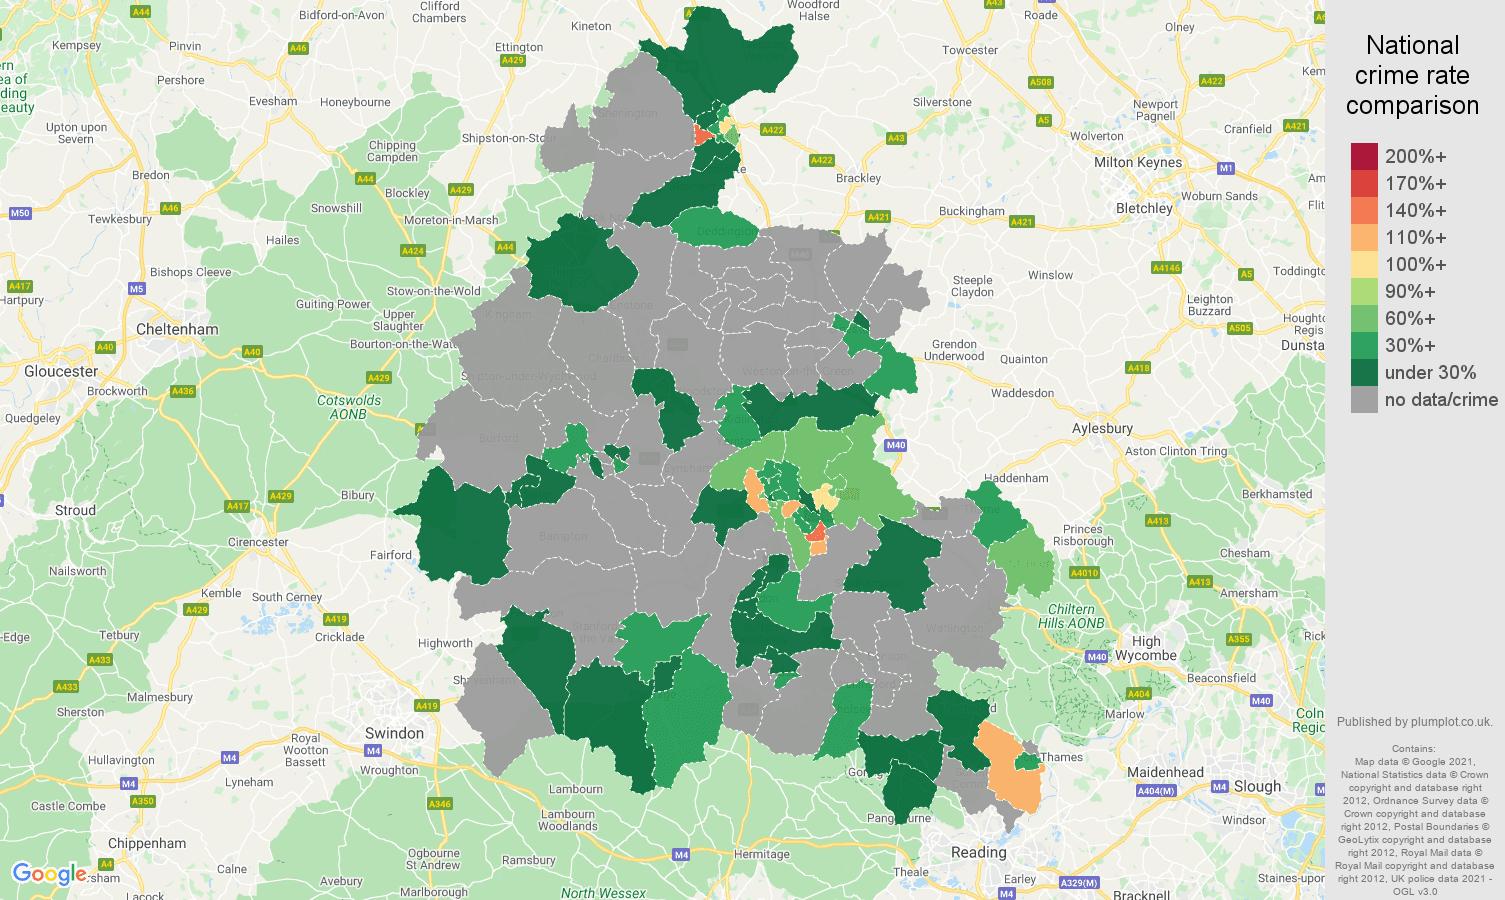 Oxfordshire robbery crime rate comparison map